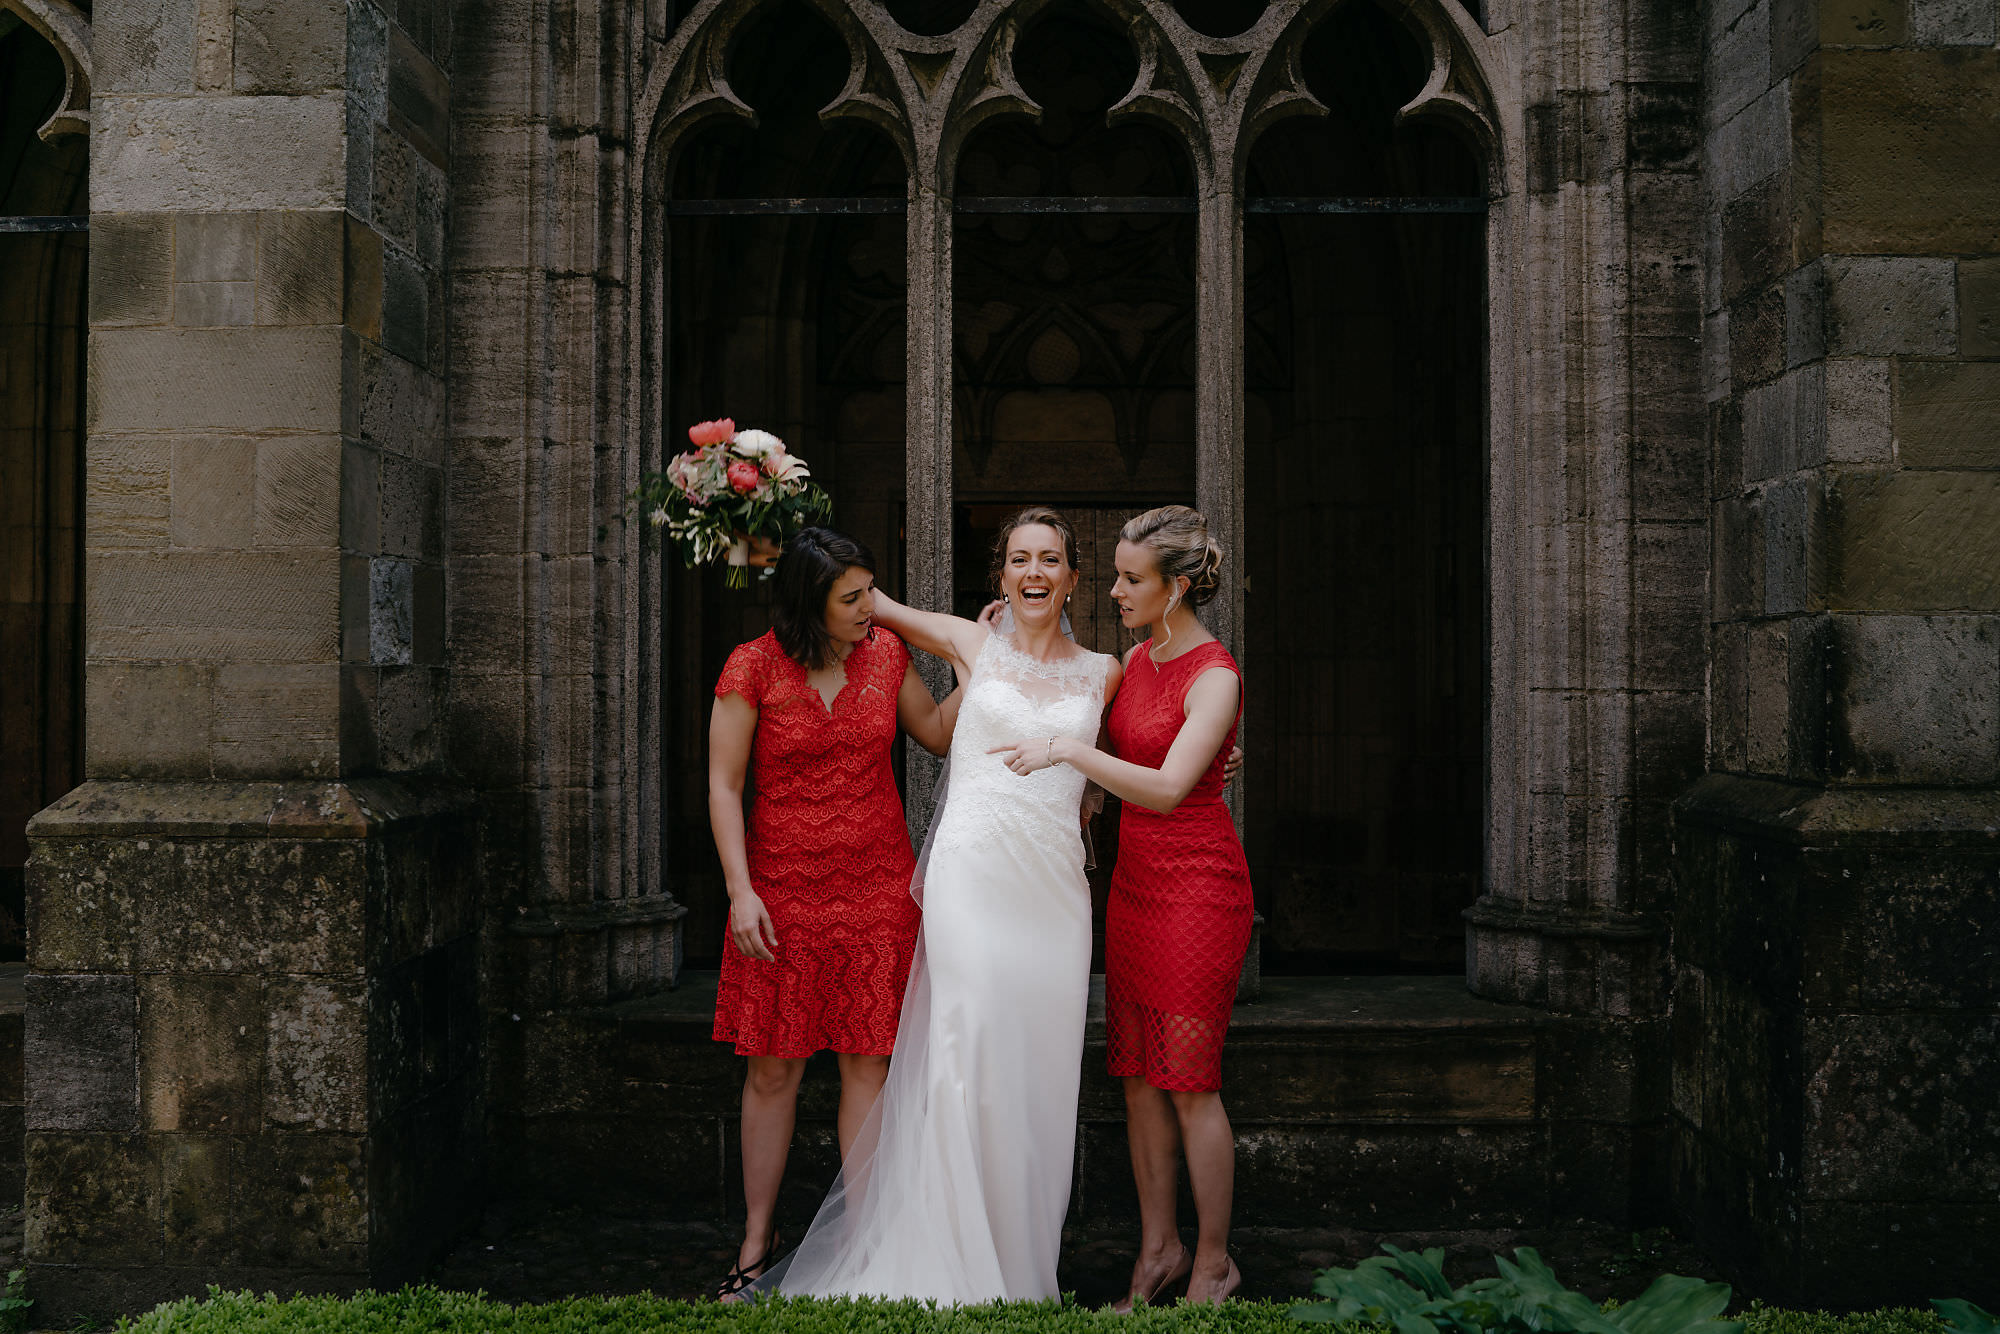 Wedding photographer Mark Hadden bride and bridesmates